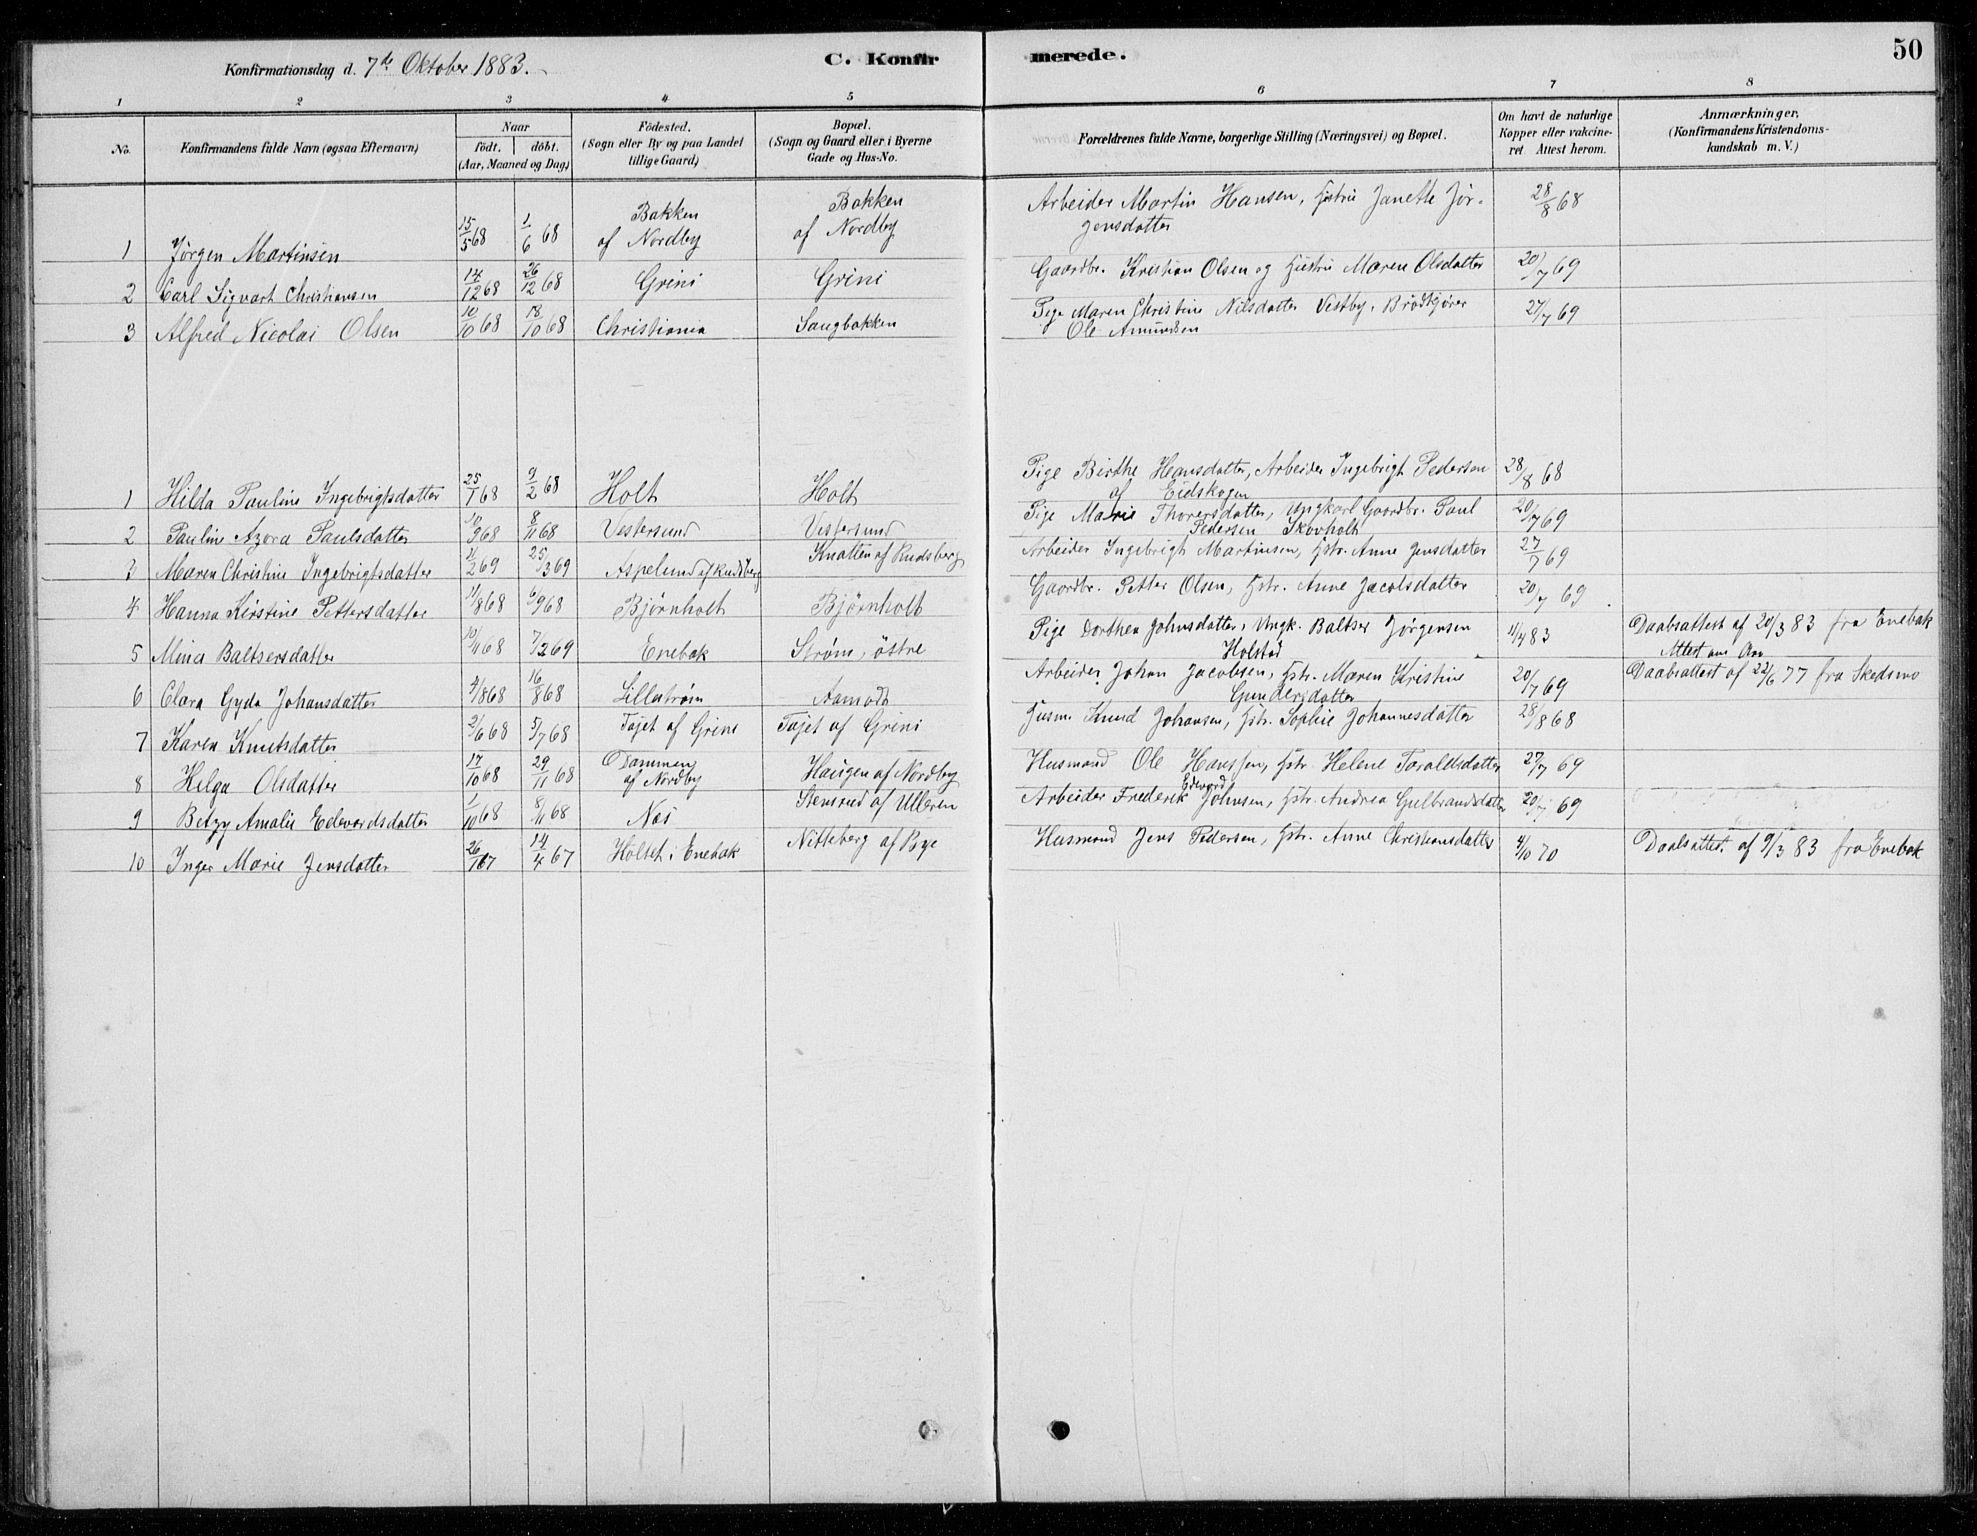 SAO, Fet prestekontor Kirkebøker, G/Gb/L0002: Parish register (copy) no. II 2, 1878-1911, p. 50